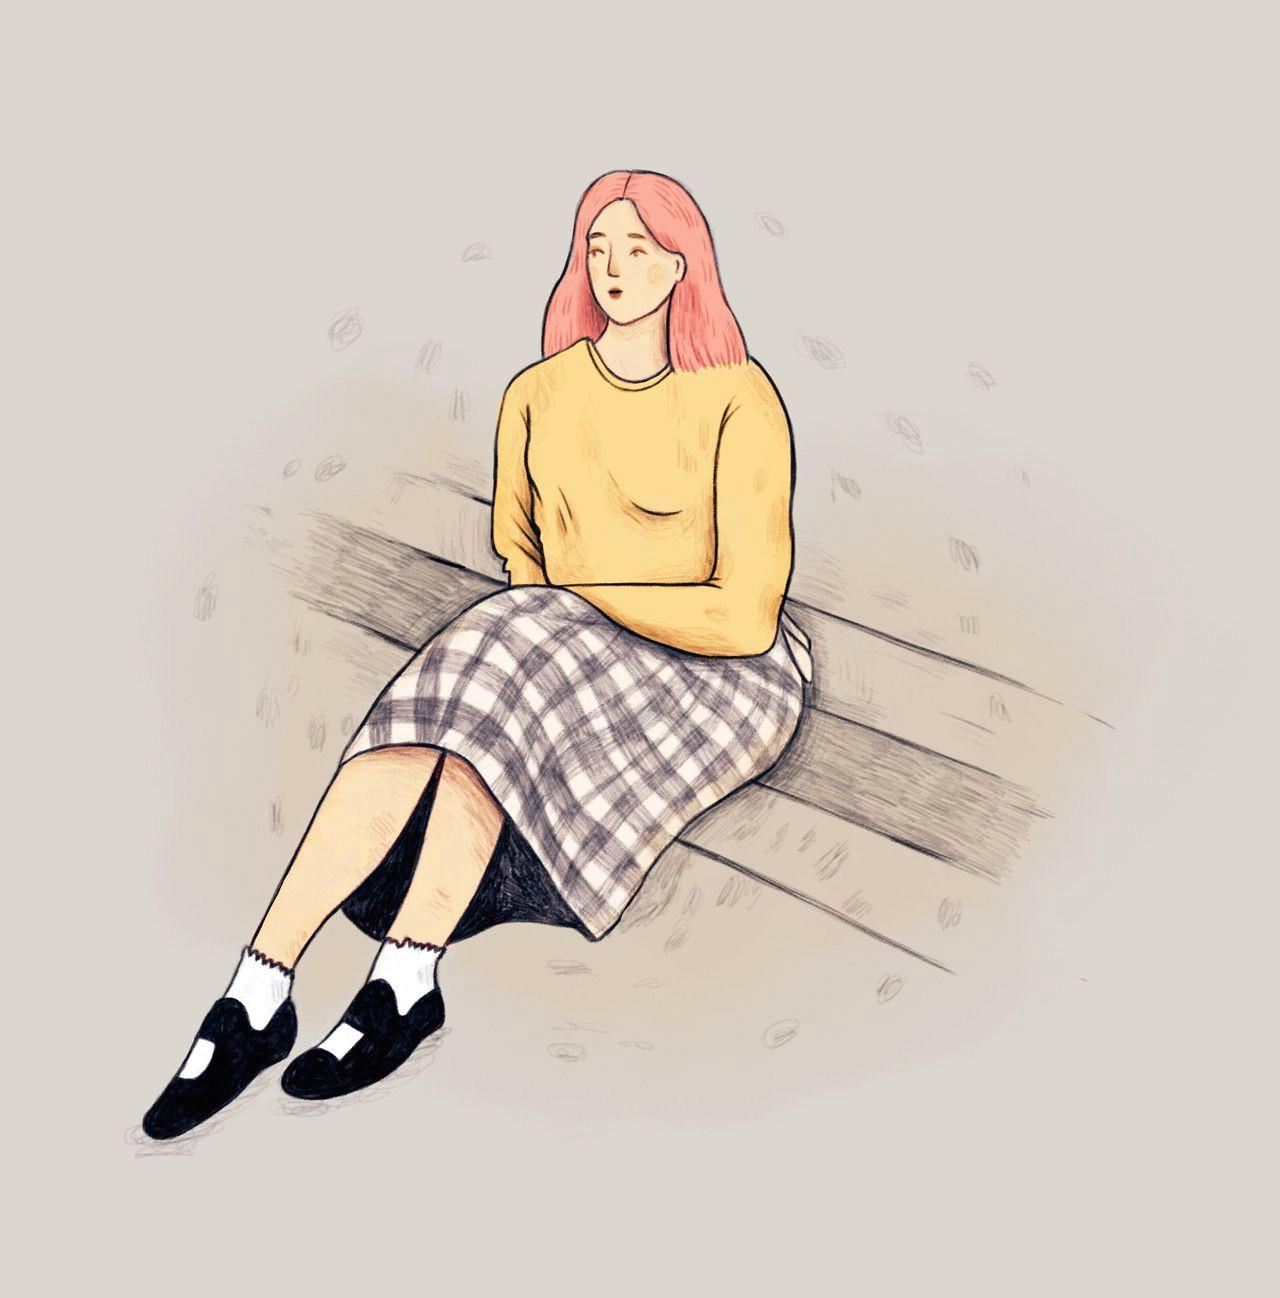 girl on the stair by illustrator emma martschinke illustration illustrator drawing girl woman skirt sweater draw sketch art artist